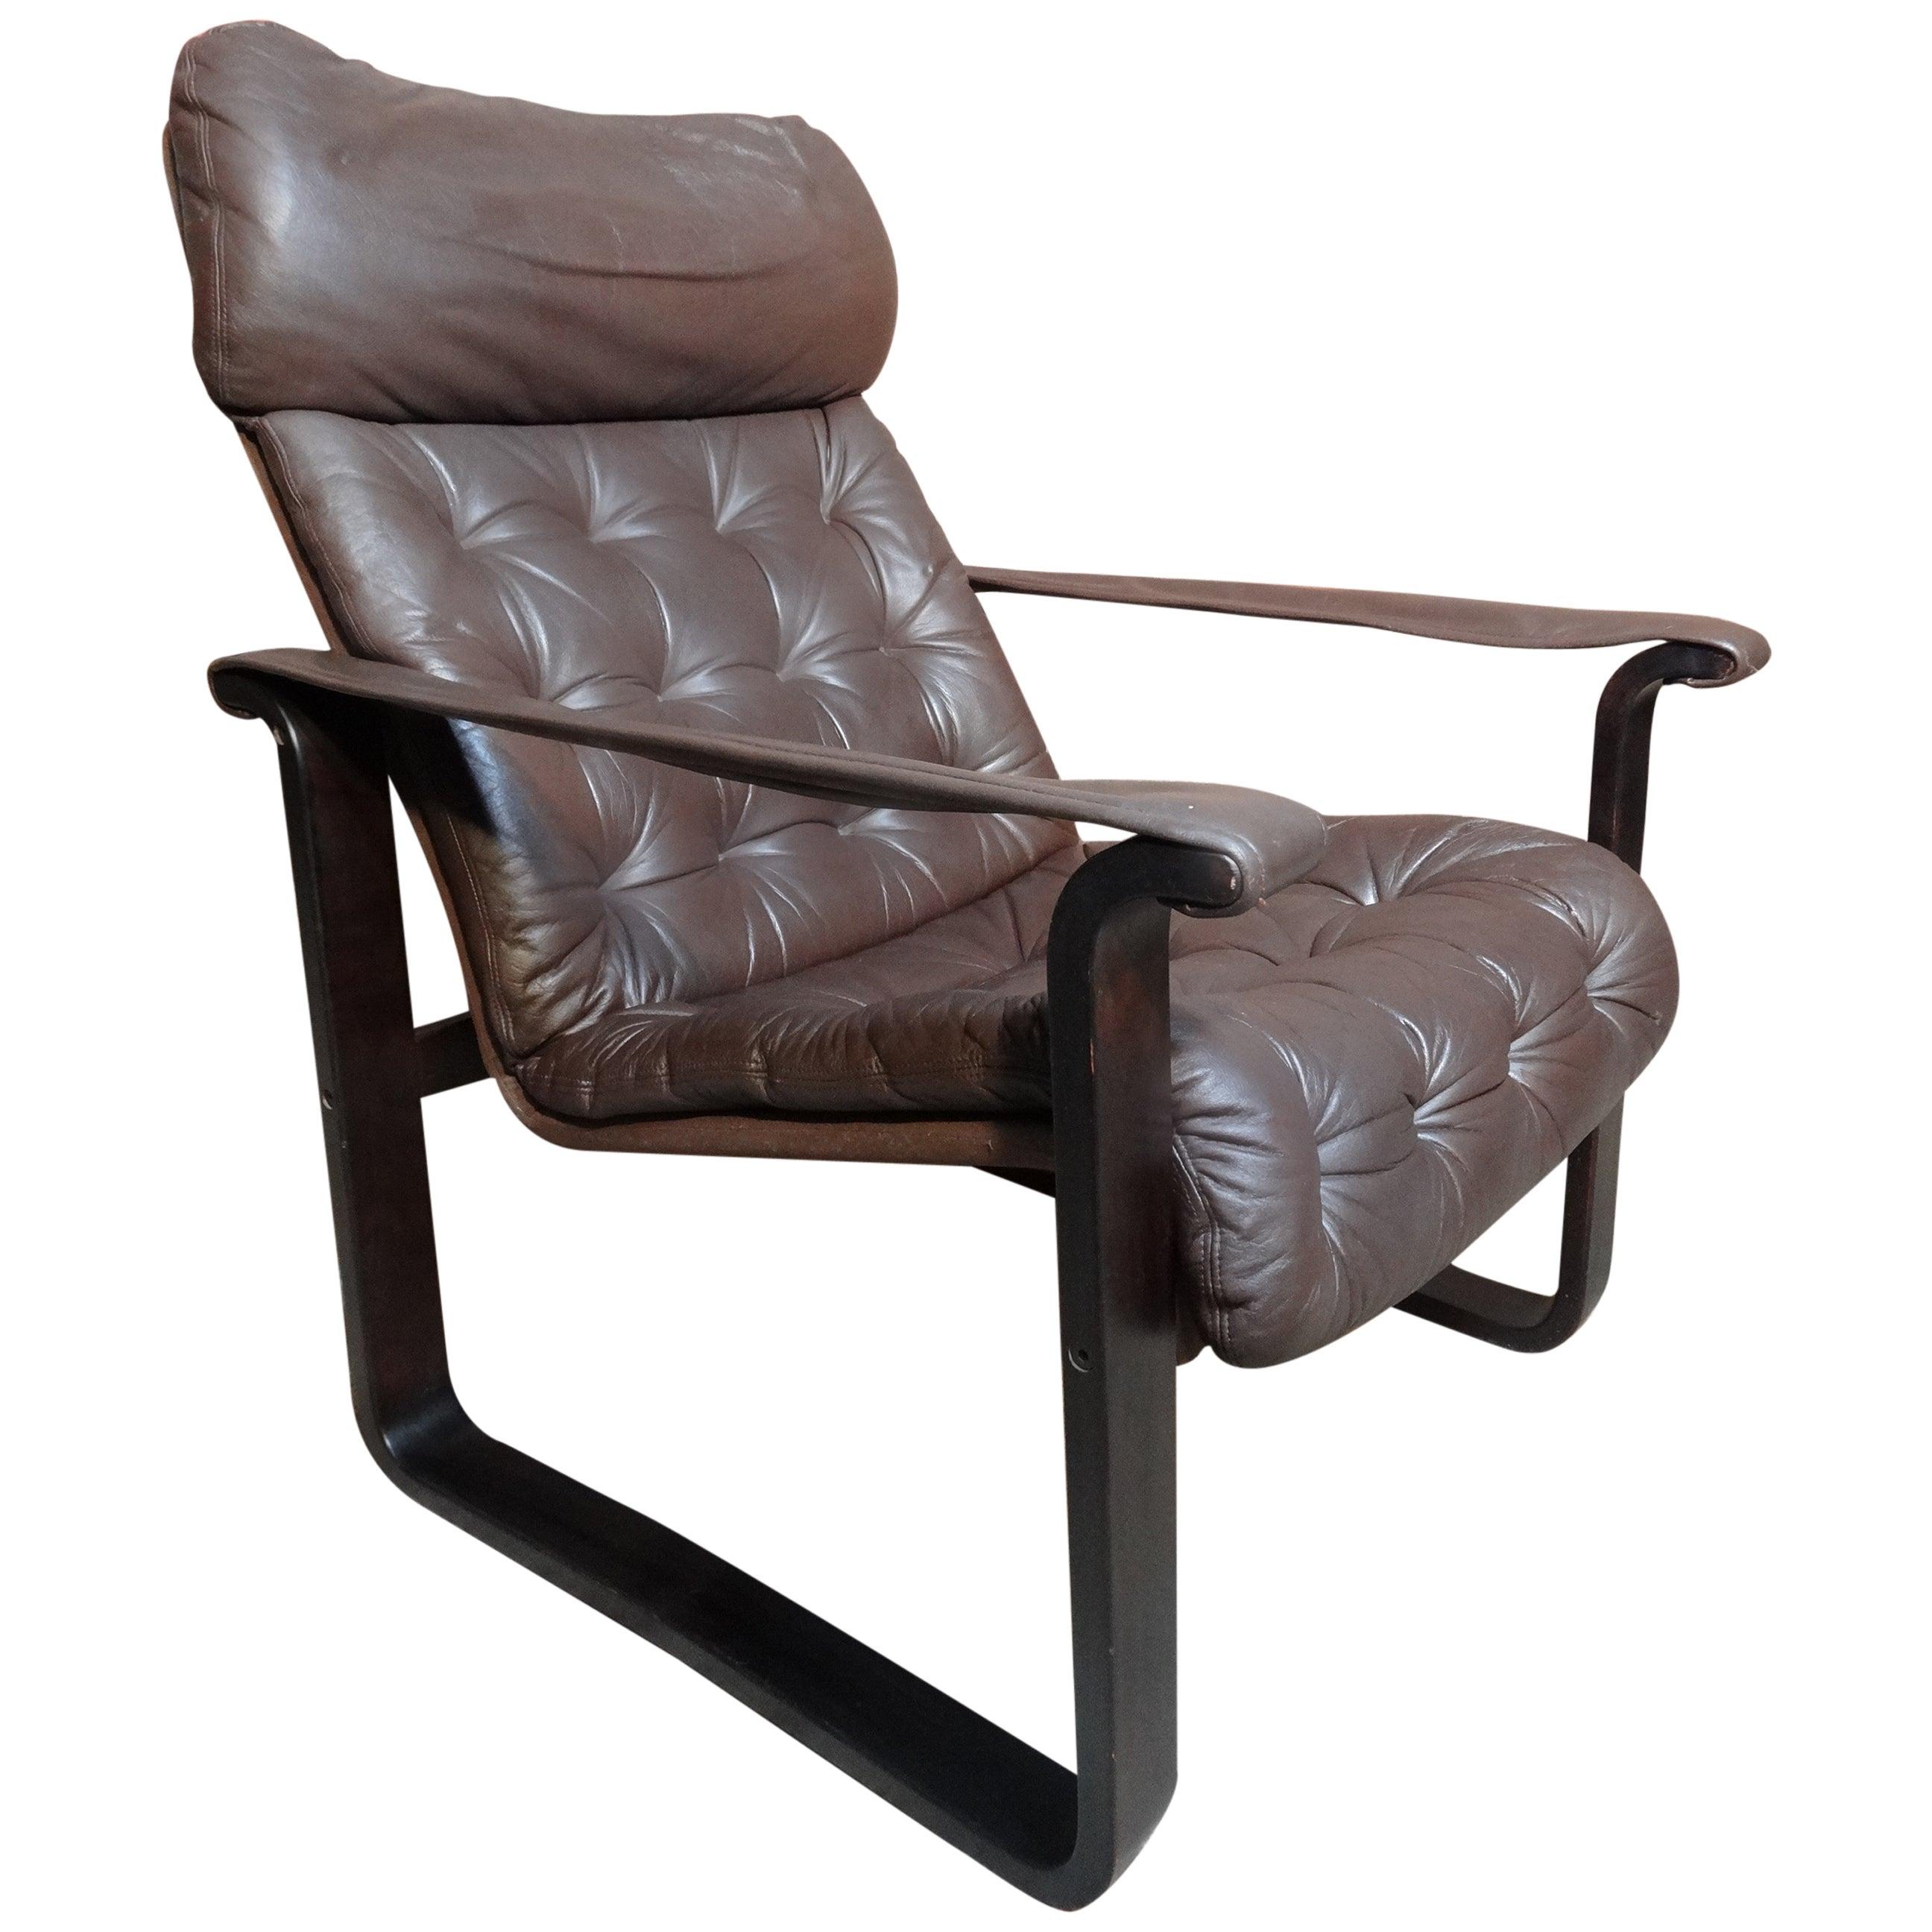 Finisch Dahlqvist A.B. Brown Leather Vintage Retro Lounge or Armchair